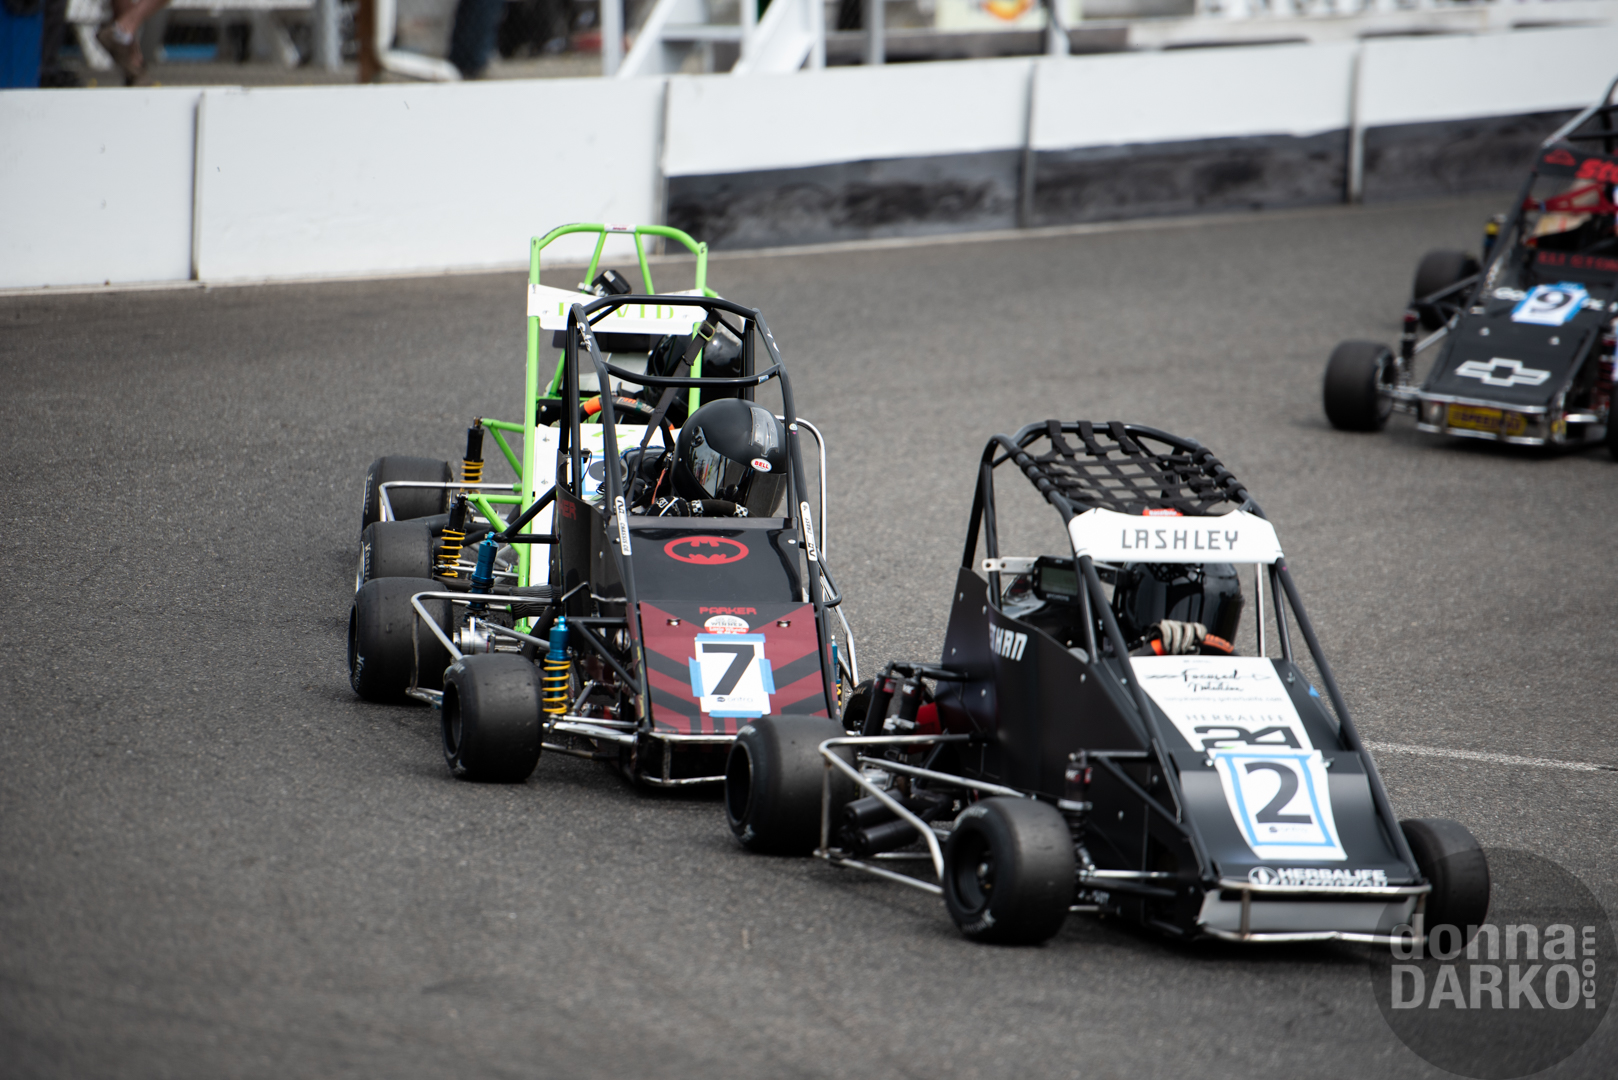 QWMA (Racing) 8-11-2019 DSC_7050.jpg